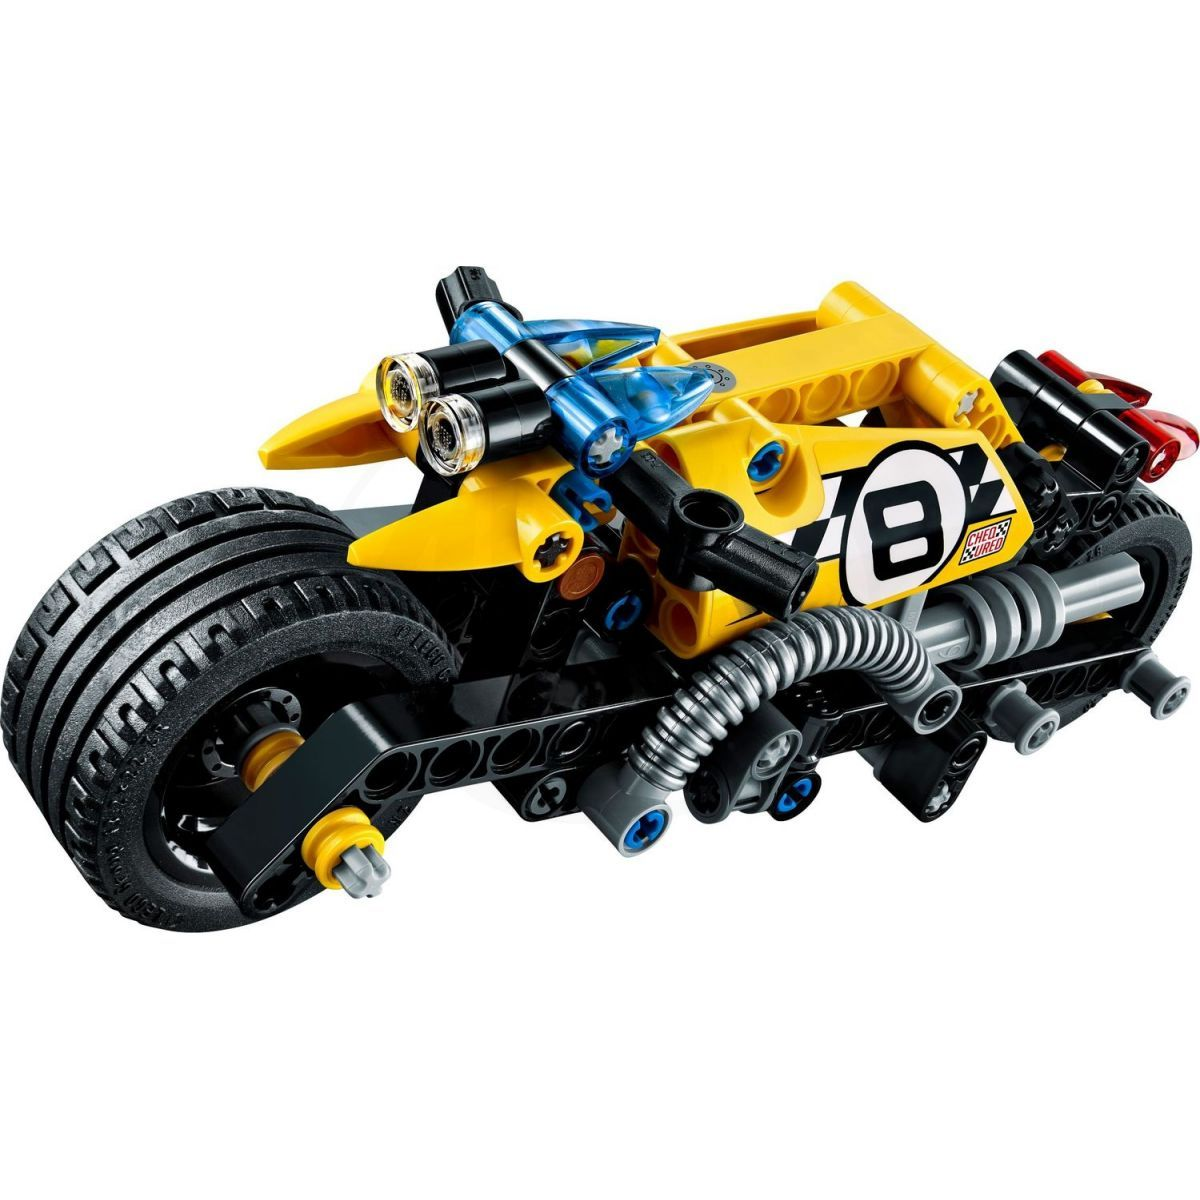 lego technic 42058 motorka pro kaskad ry 4kids. Black Bedroom Furniture Sets. Home Design Ideas